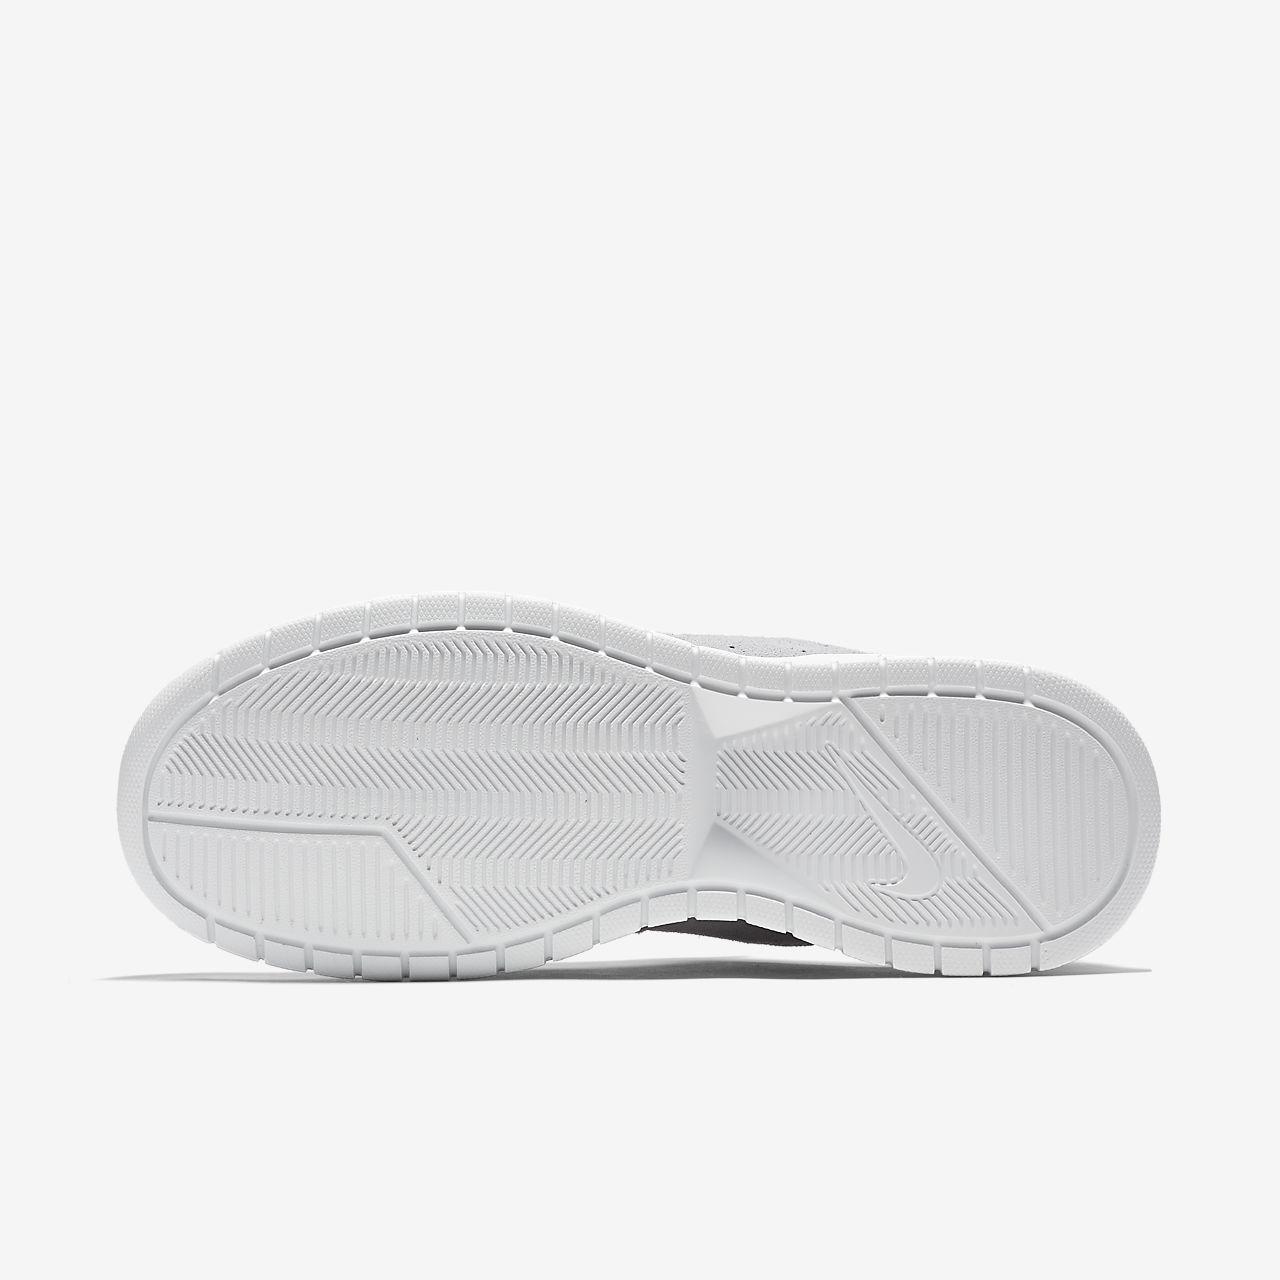 11576e598ffc9 Low Resolution Nike Benassi Slip Shoe Nike Benassi Slip Shoe